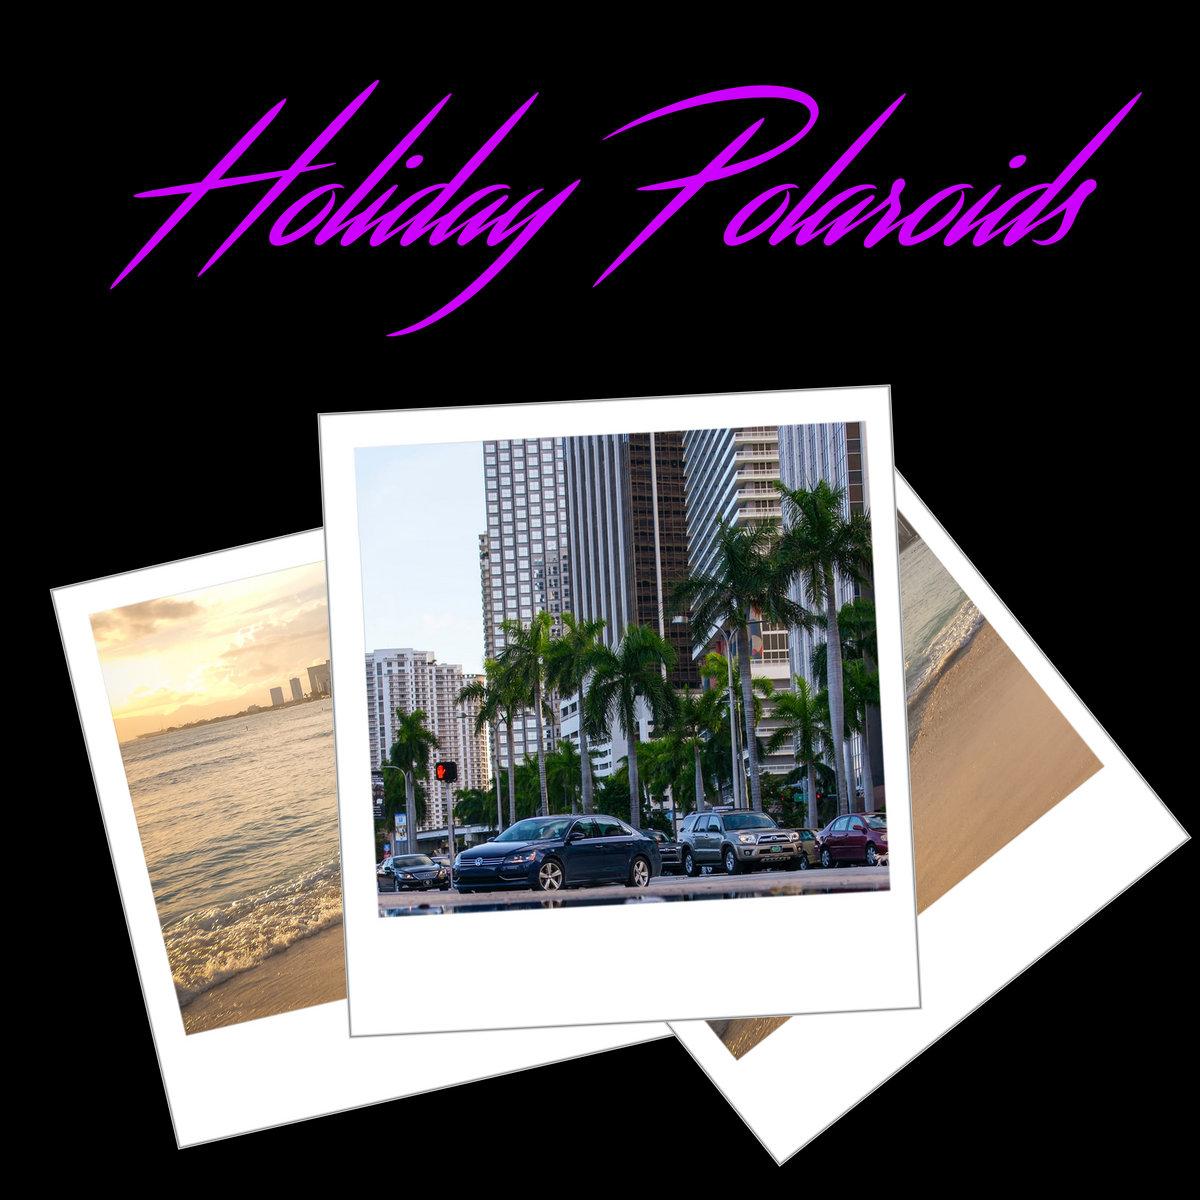 Synthaholic, 'Holiday Polaroids' (Album)